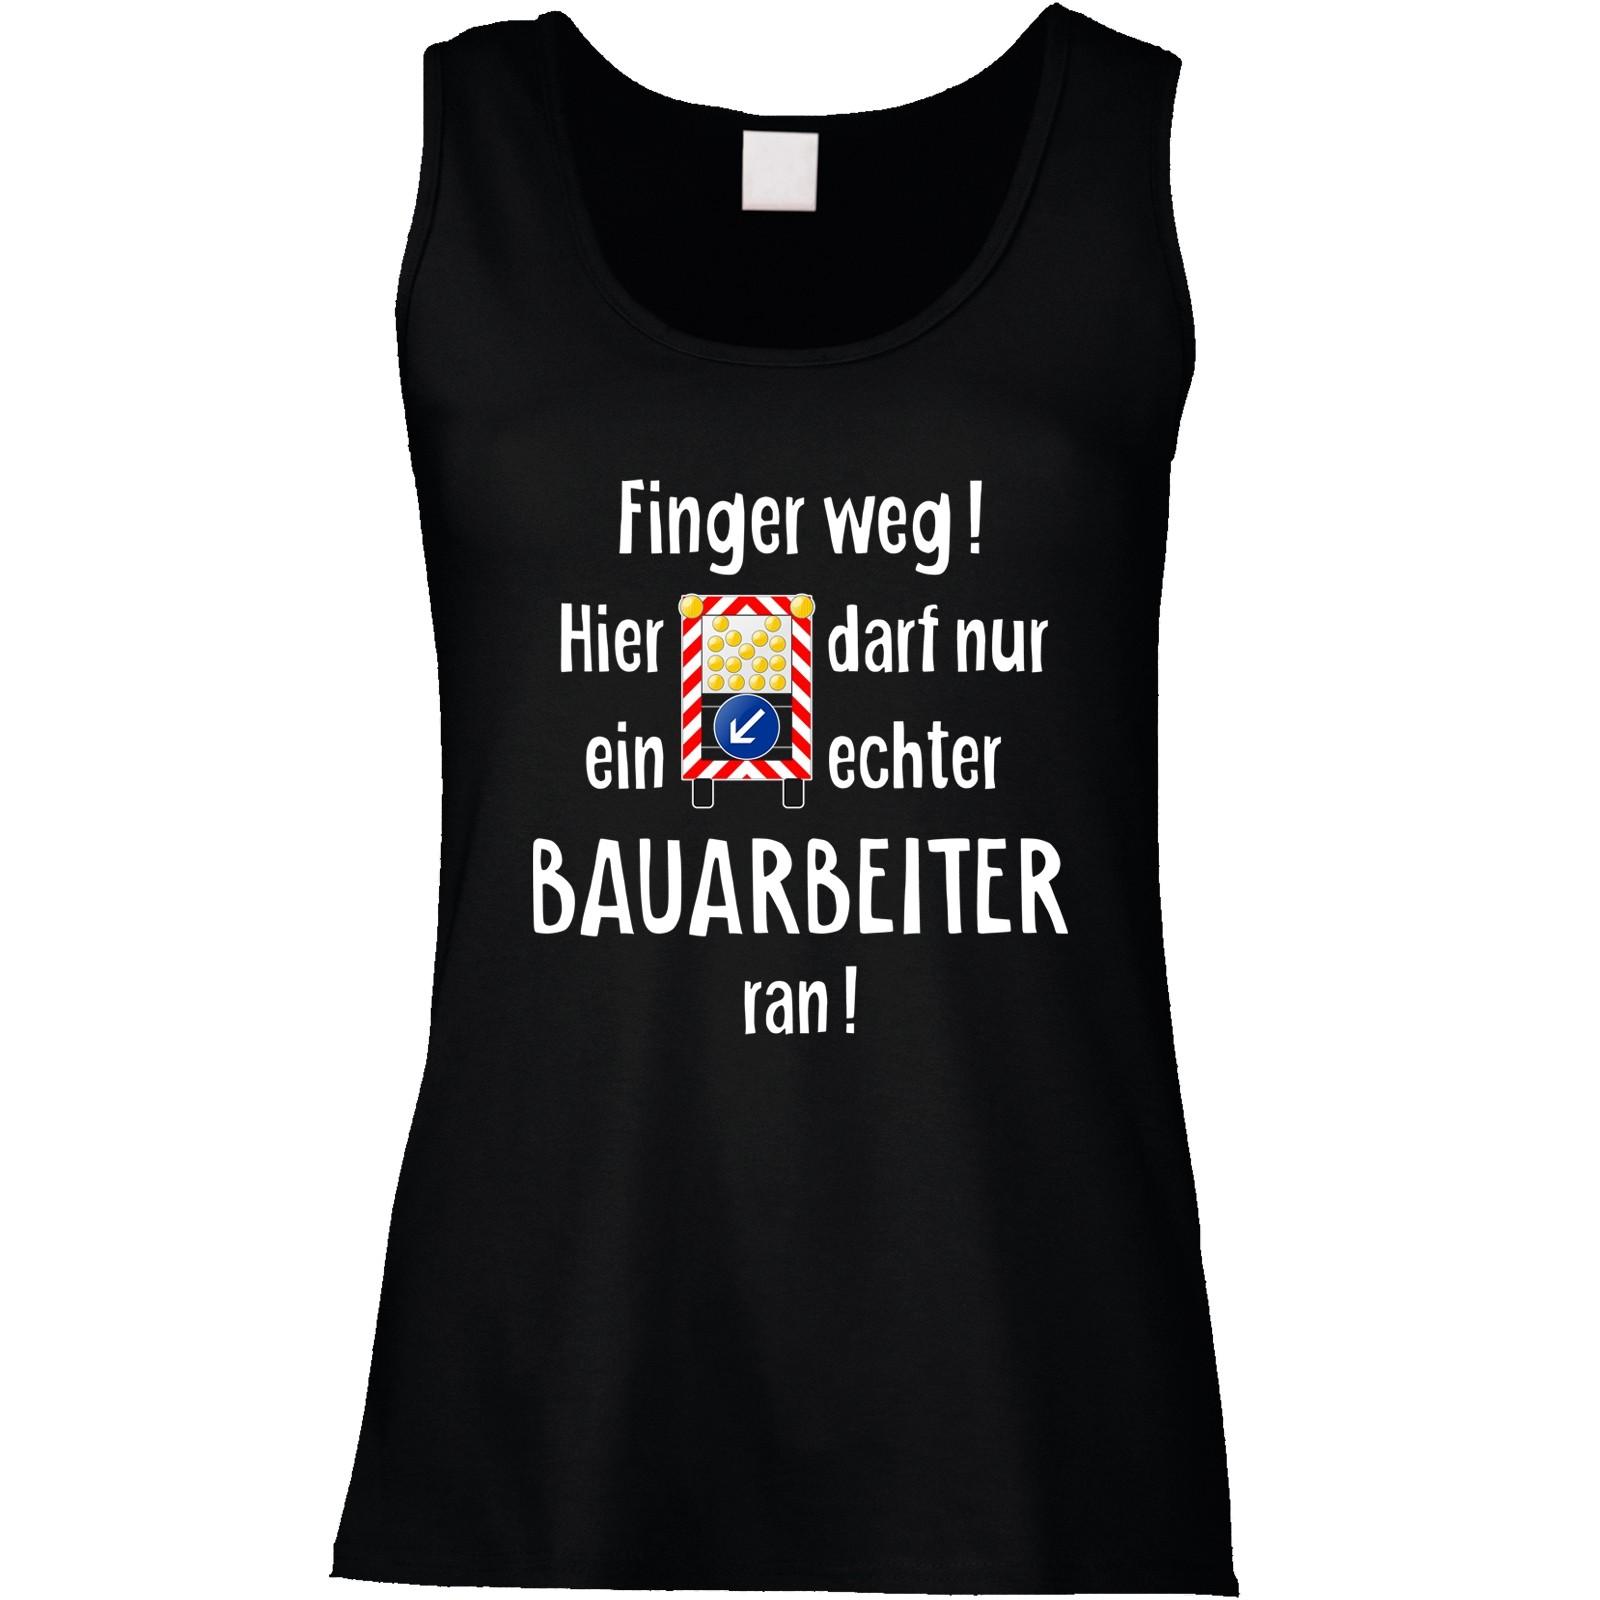 Funshirt oder Tanktop: Finger weg! (Bauarbeiter)